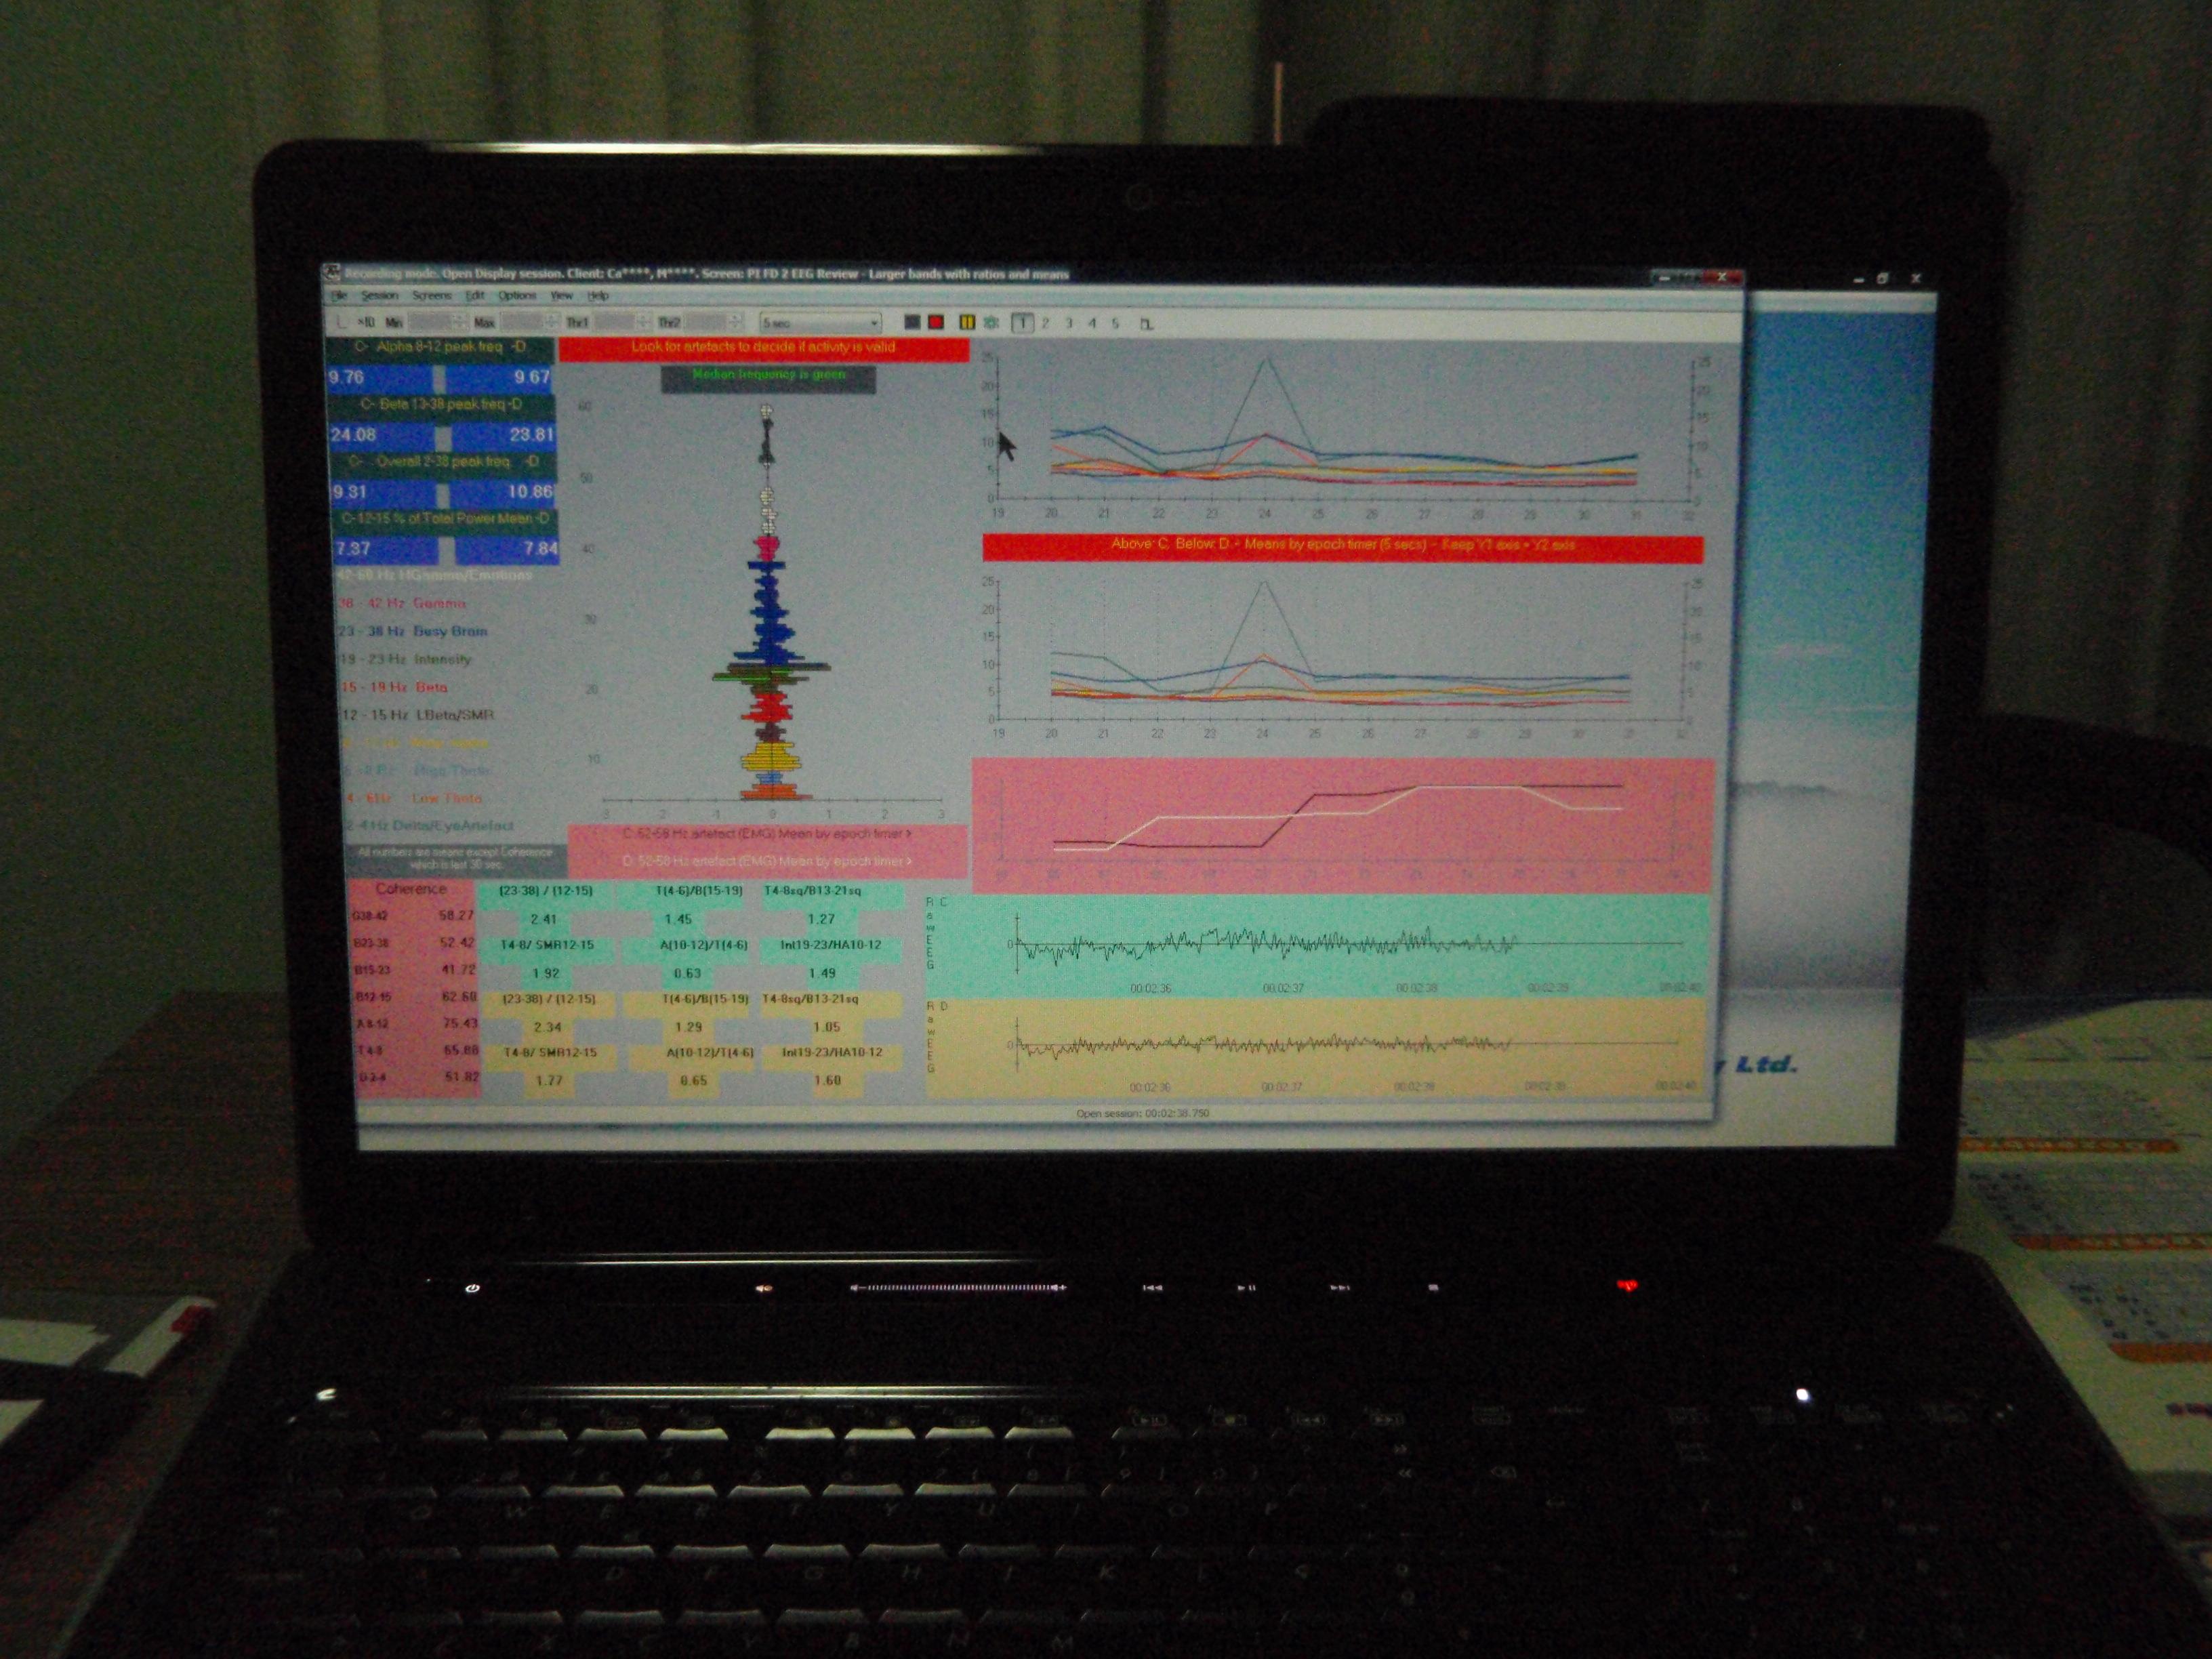 z score neurofeedback clinical applications